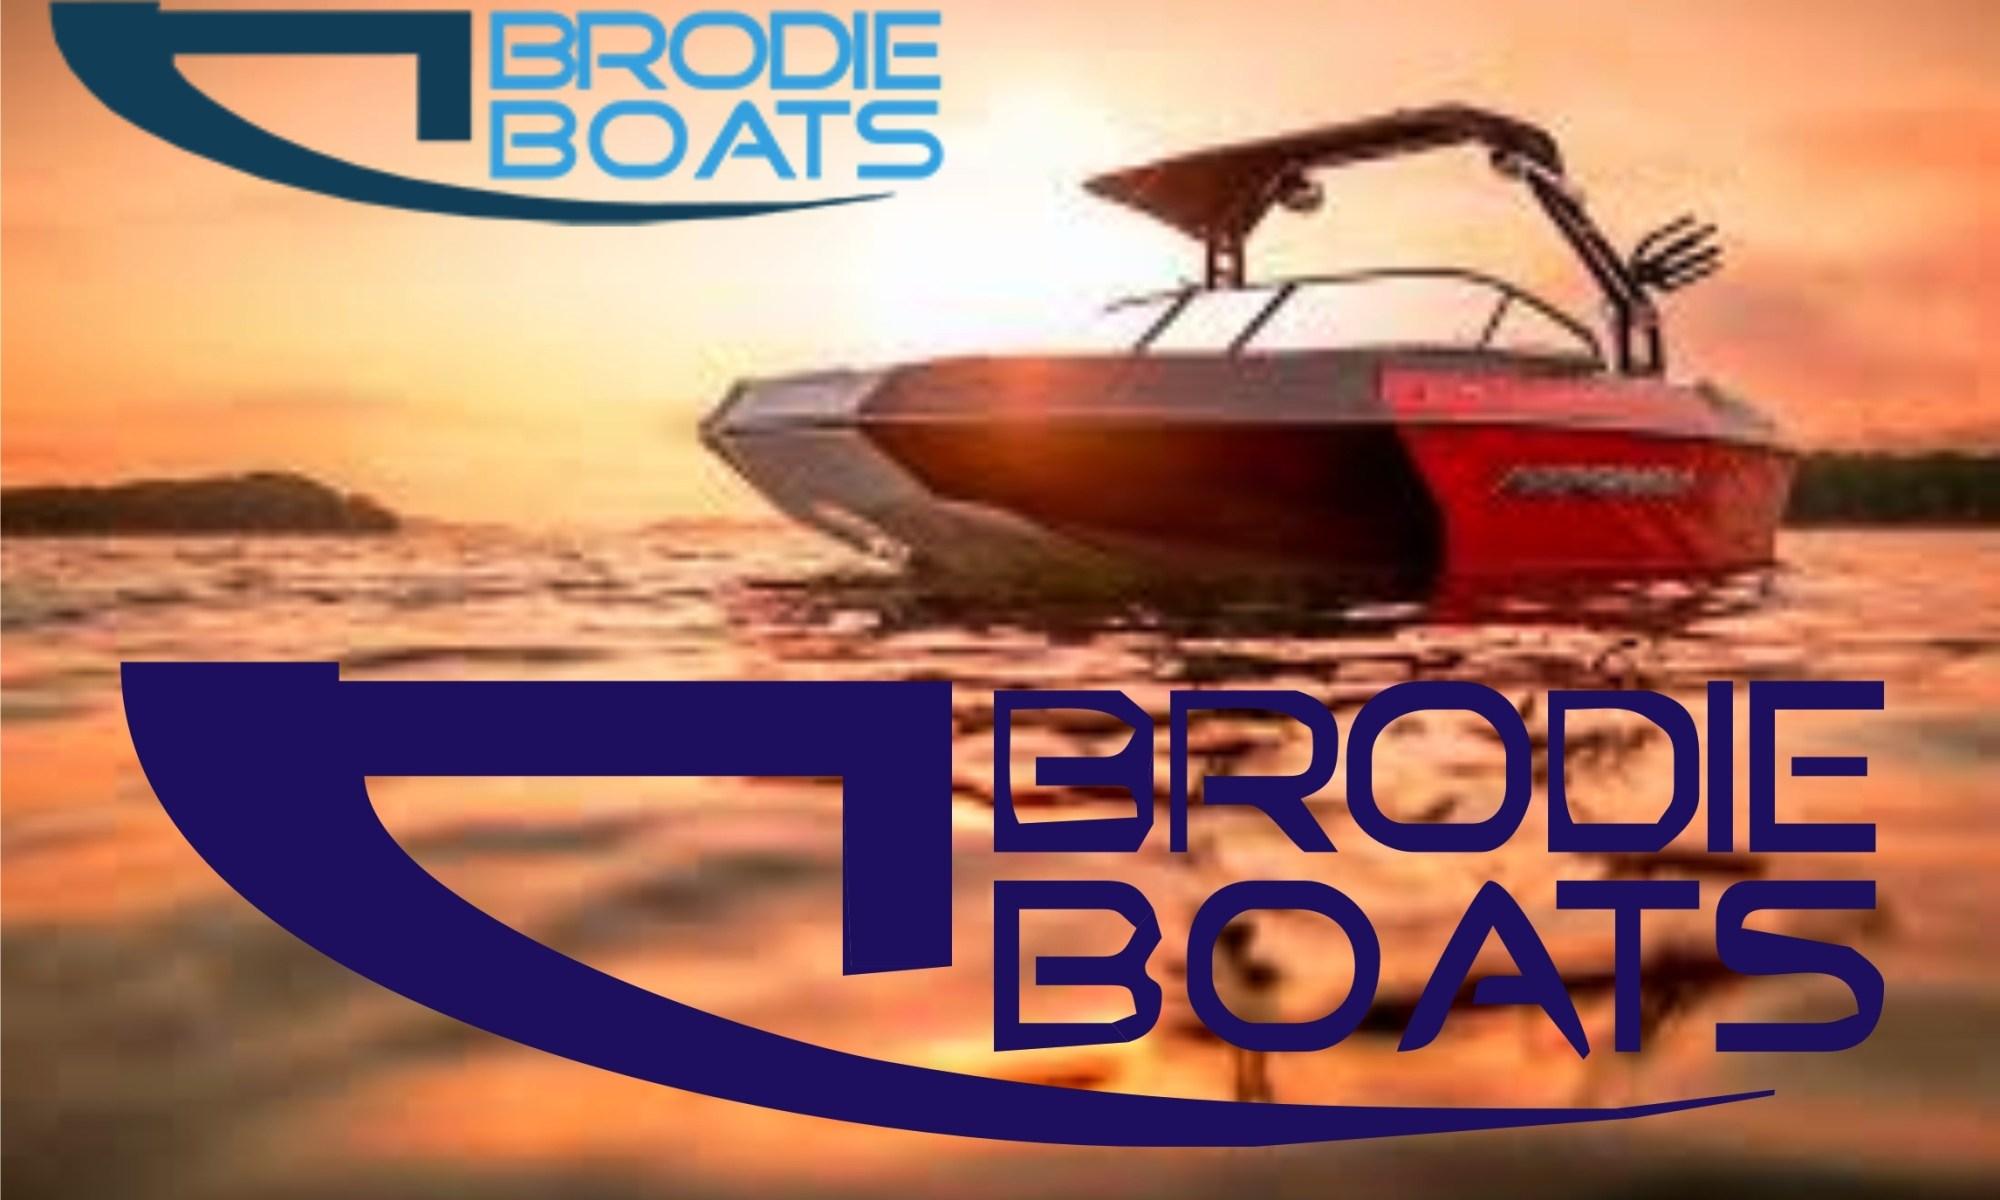 brodie boats dubai yas abu dhabie wakeboard